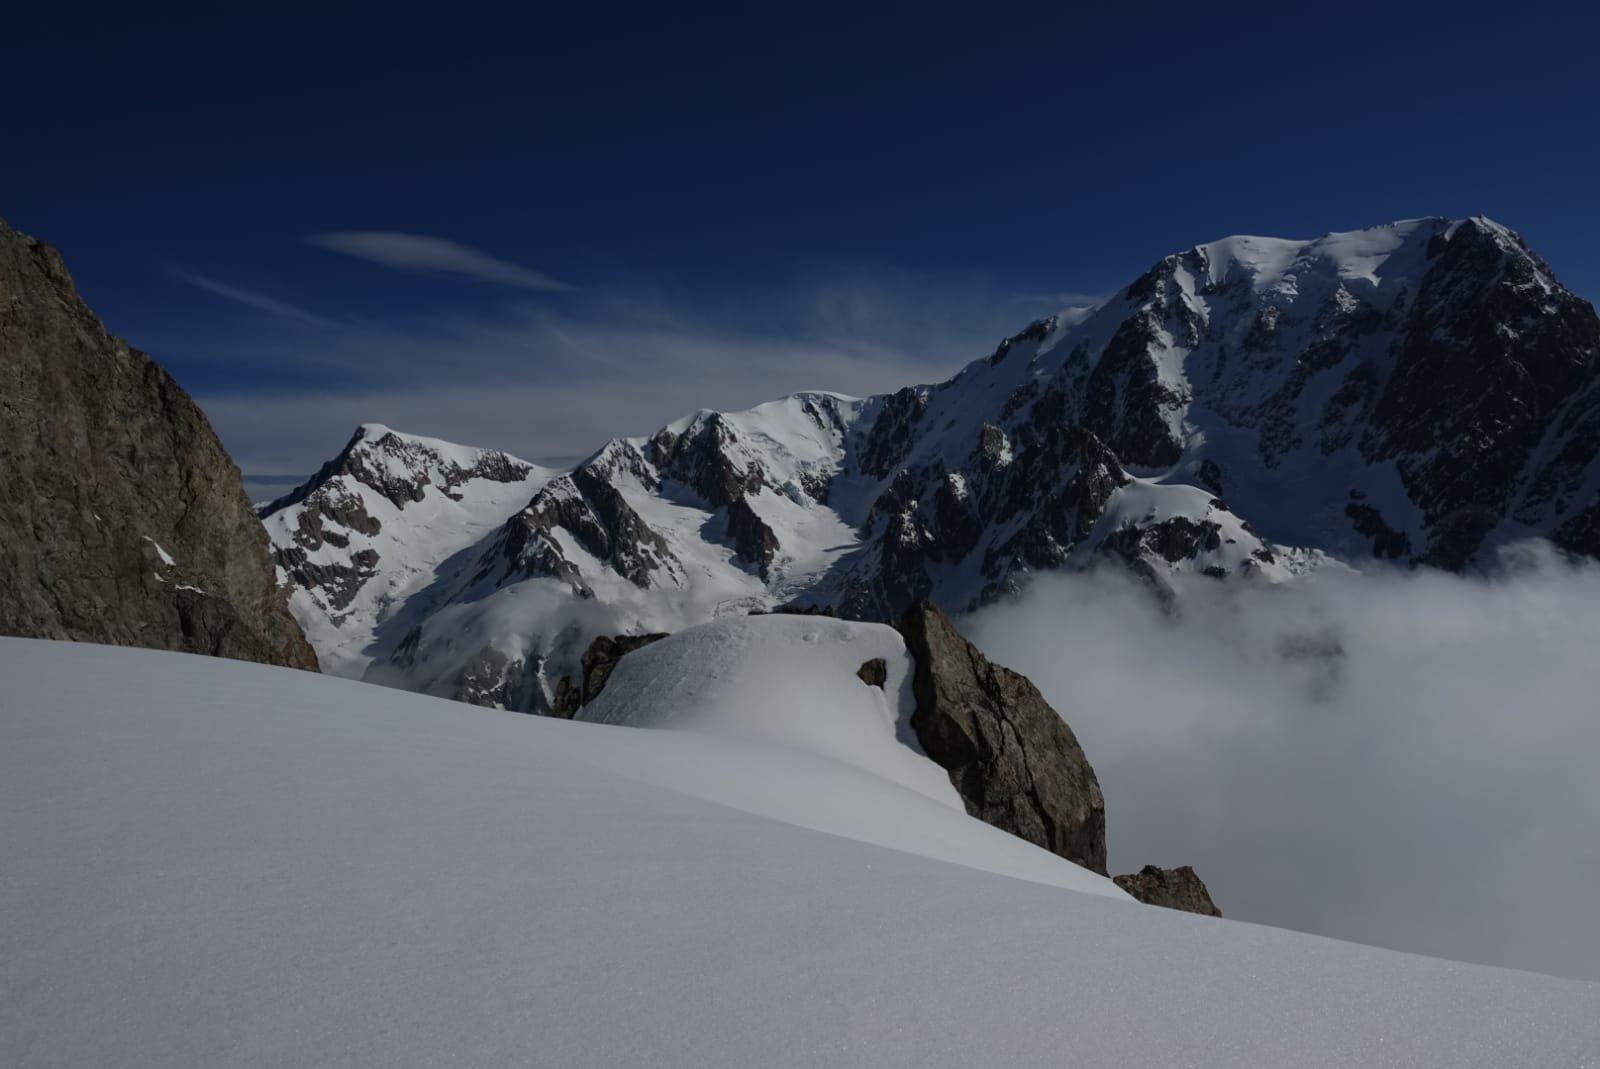 Sua Maestà visto dal colle fra la Aguille de L'Aigle ed il Petit Mont Blanc